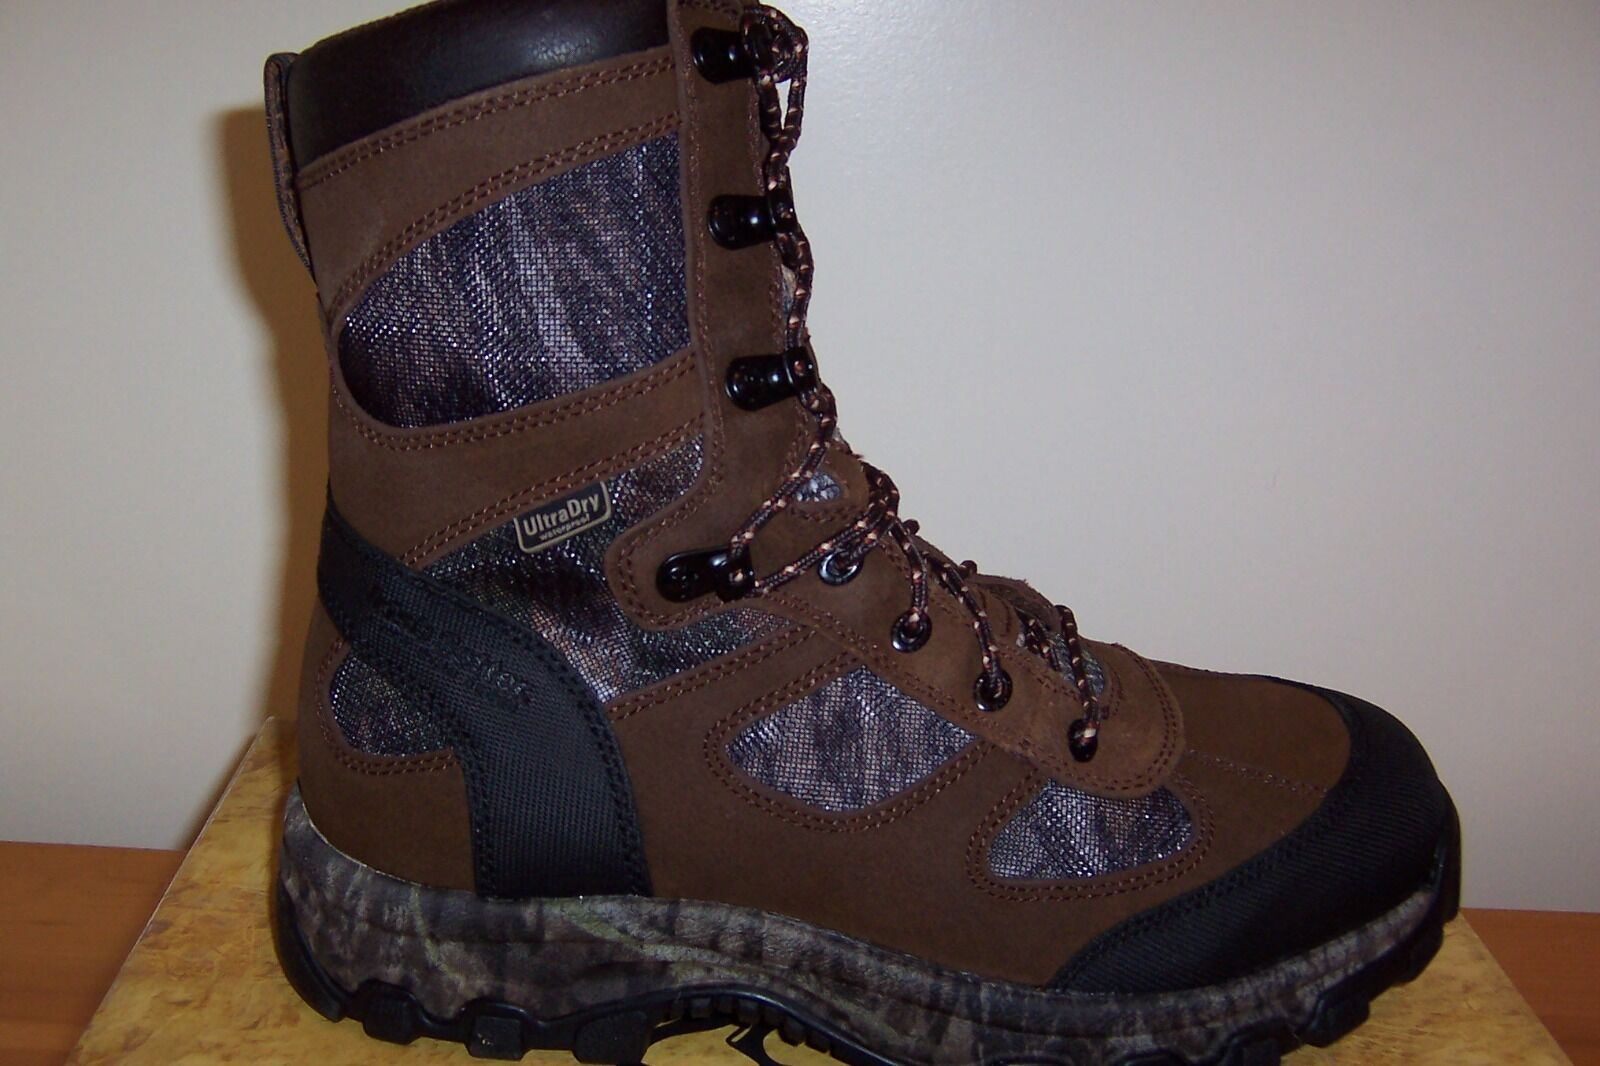 3856  Uomo  UltraDry waterproofing size 11.0 Camo. E Brown Pelle Camo. 11.0 550d4b